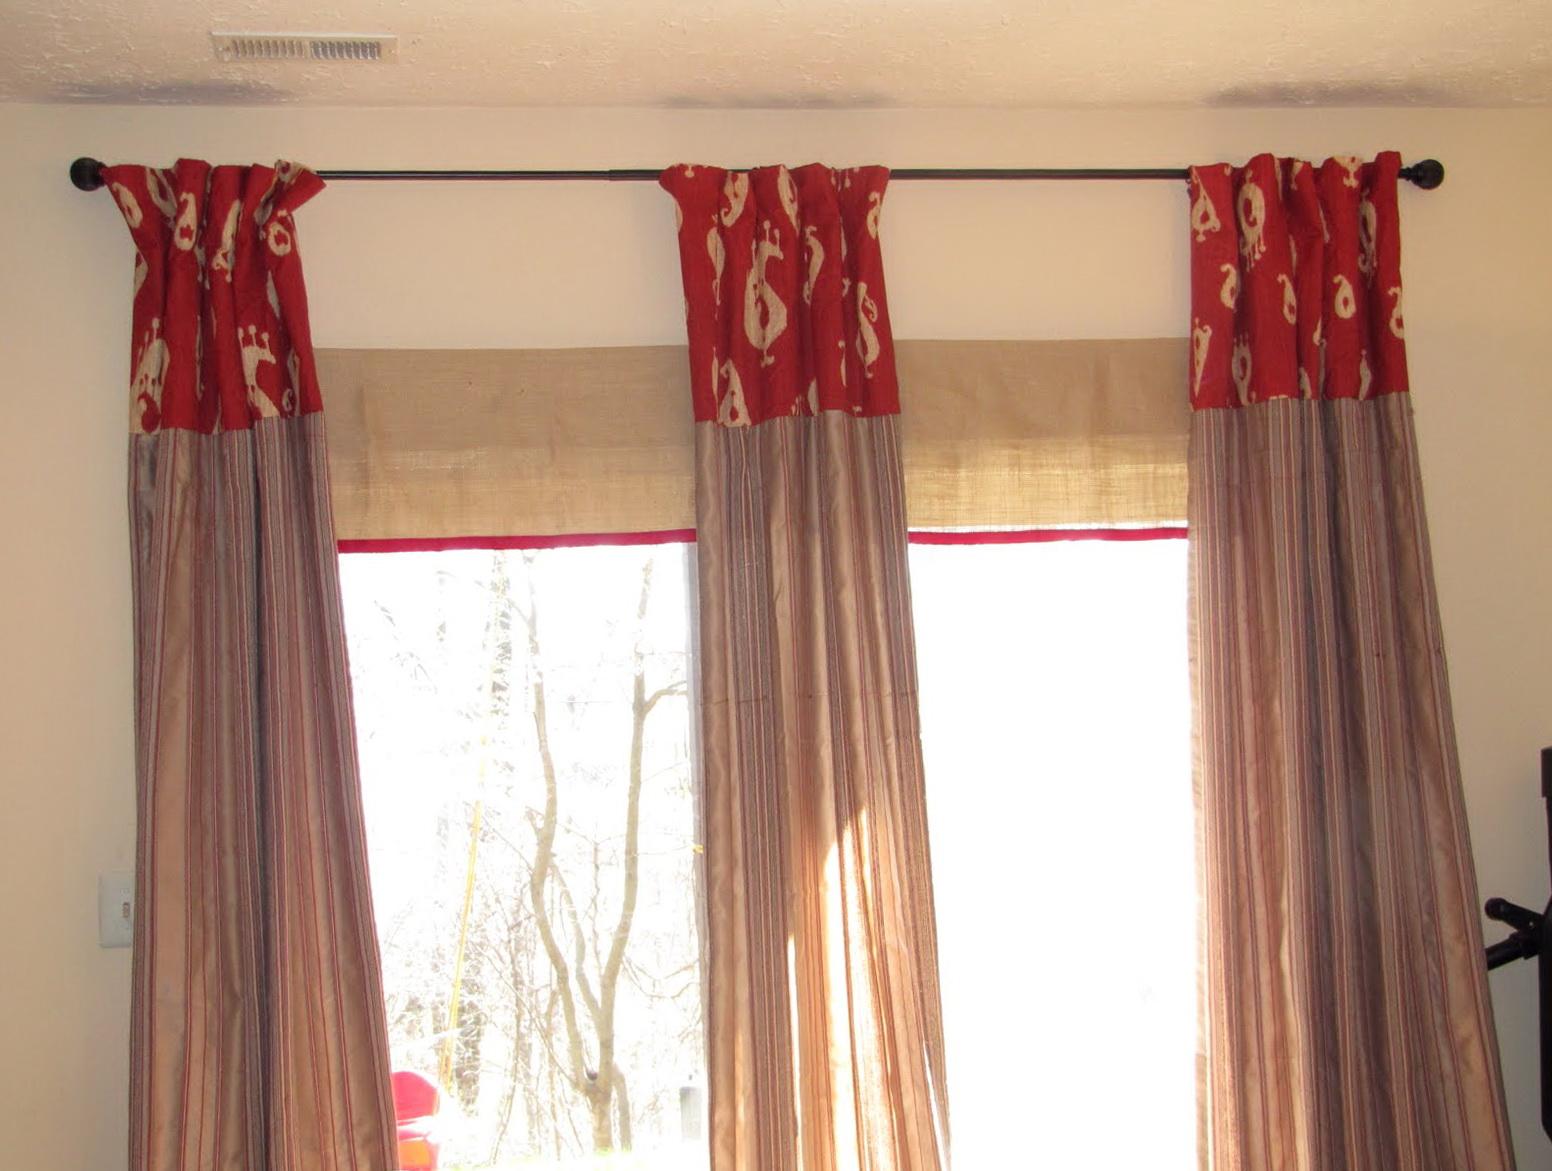 Curtain Rod For Sliding Glass Door